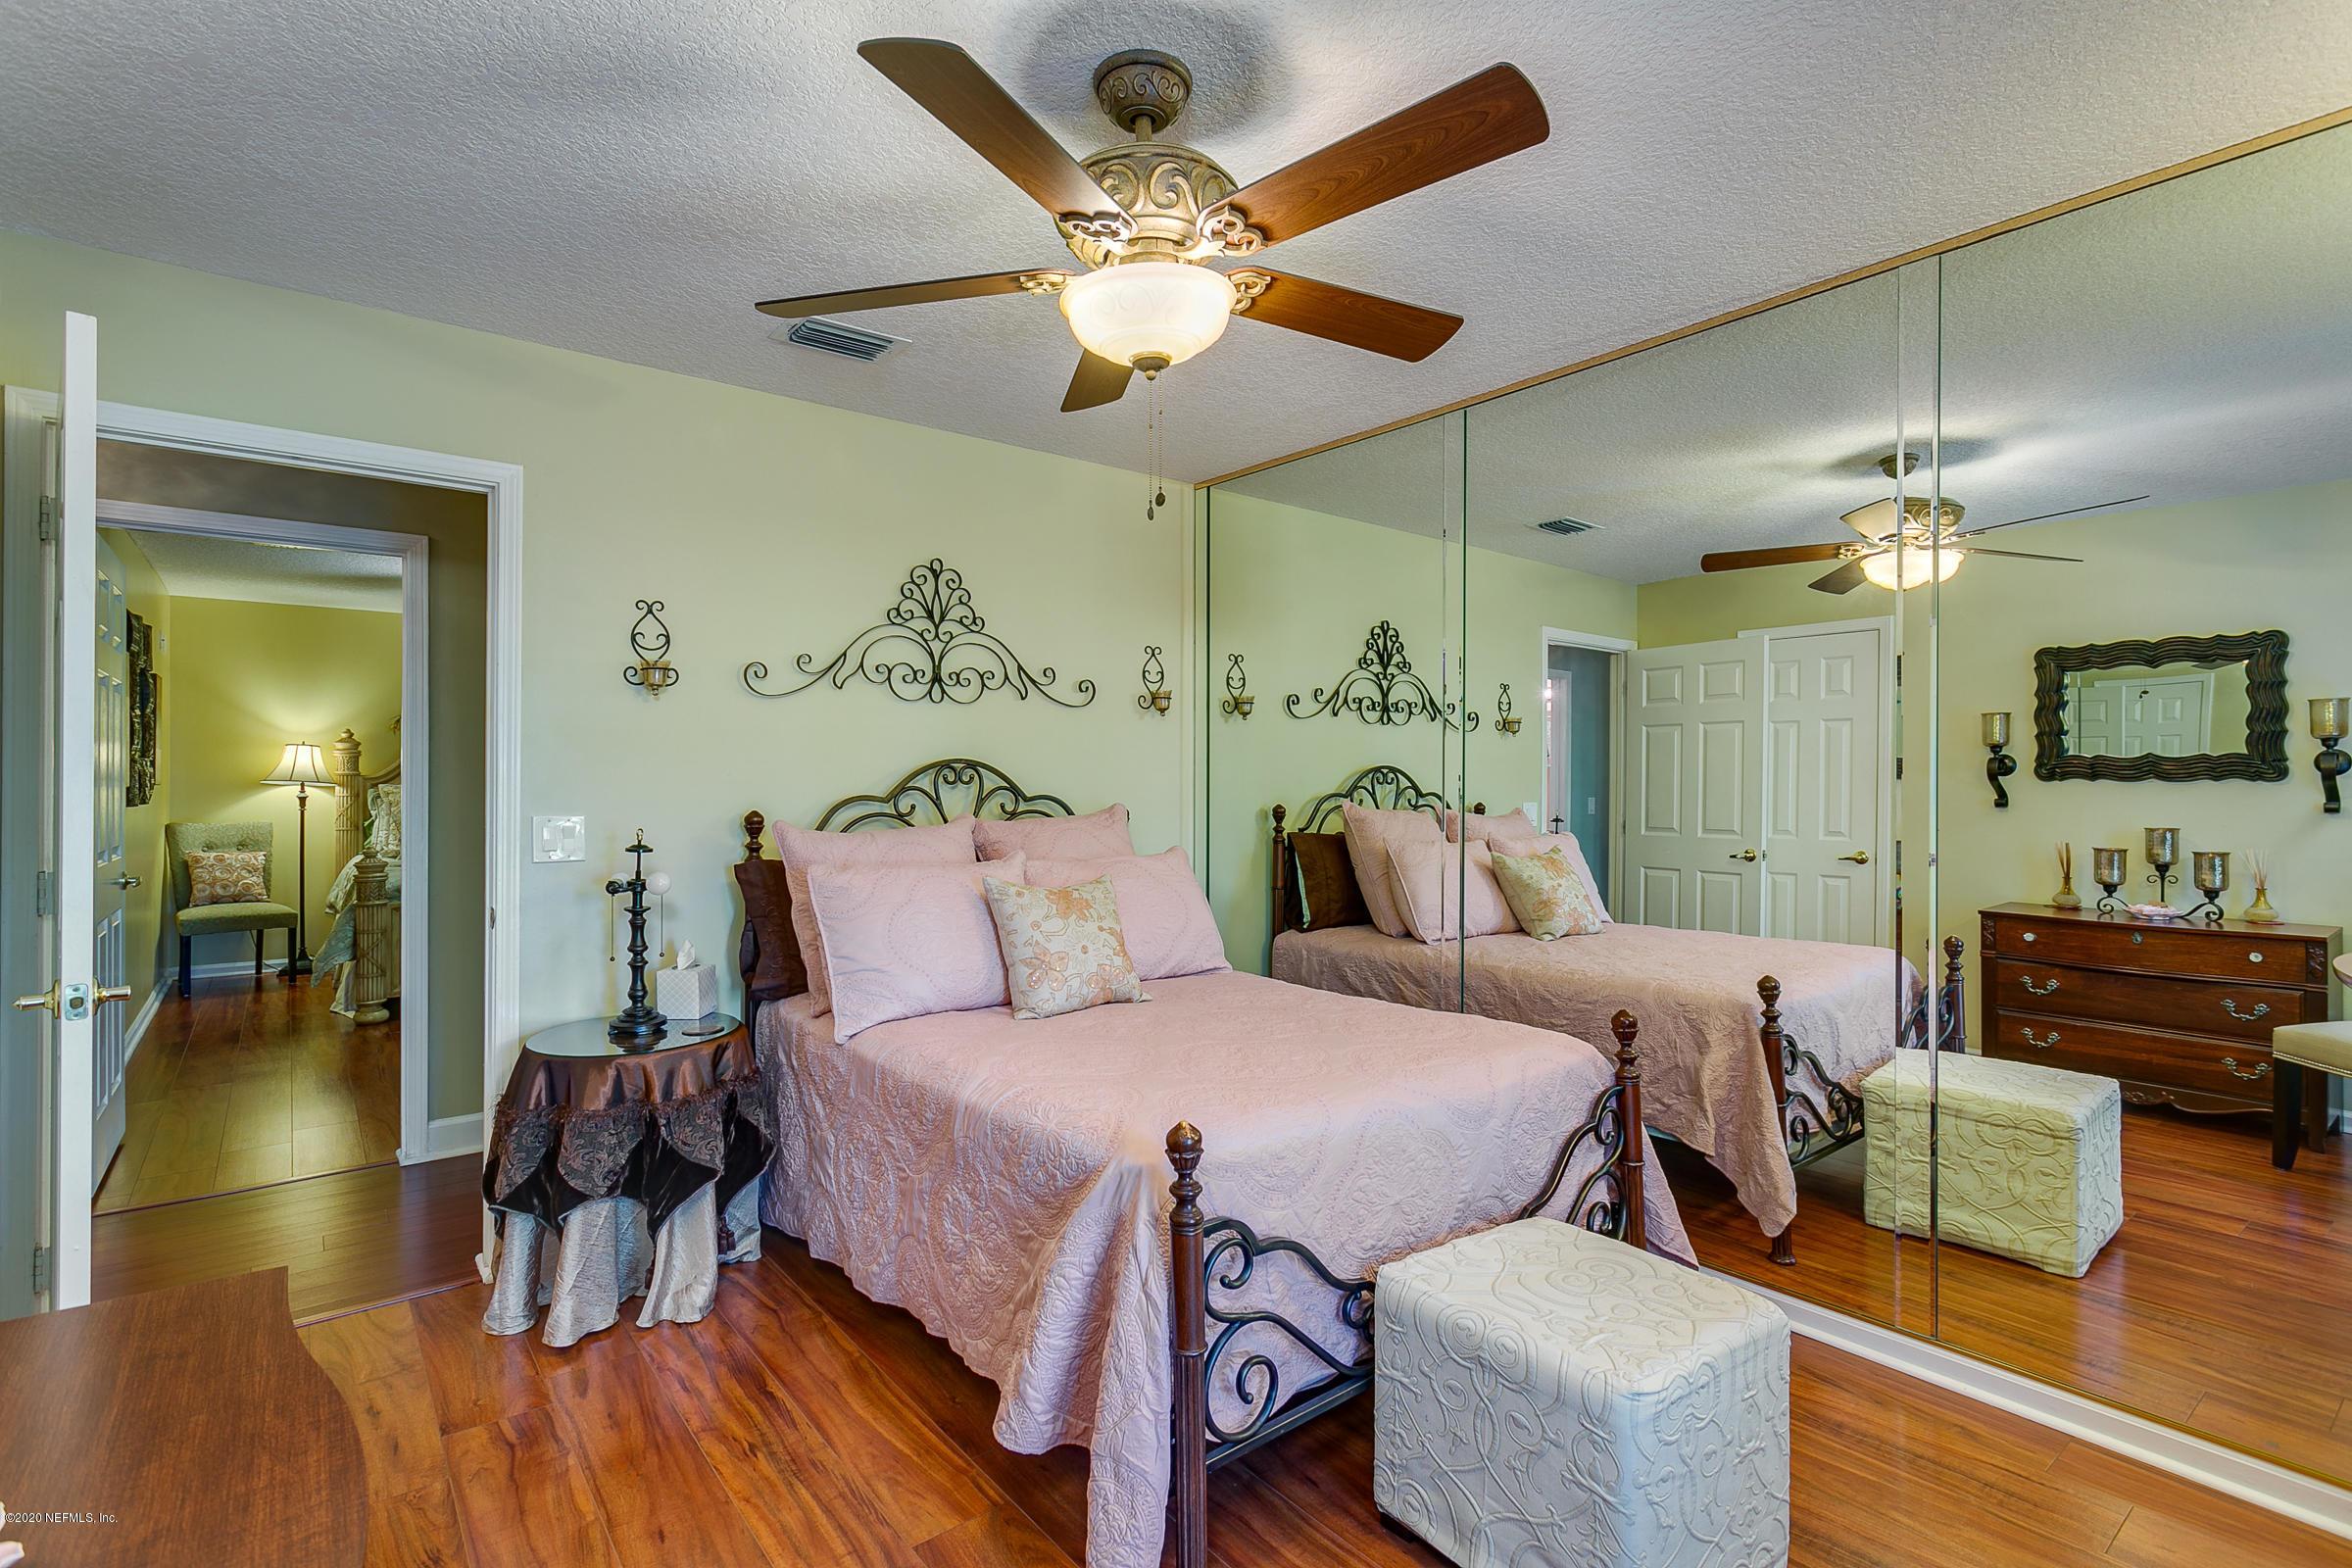 10172 GLENNFIELD, JACKSONVILLE, FLORIDA 32221, 4 Bedrooms Bedrooms, ,2 BathroomsBathrooms,Residential,For sale,GLENNFIELD,1083113